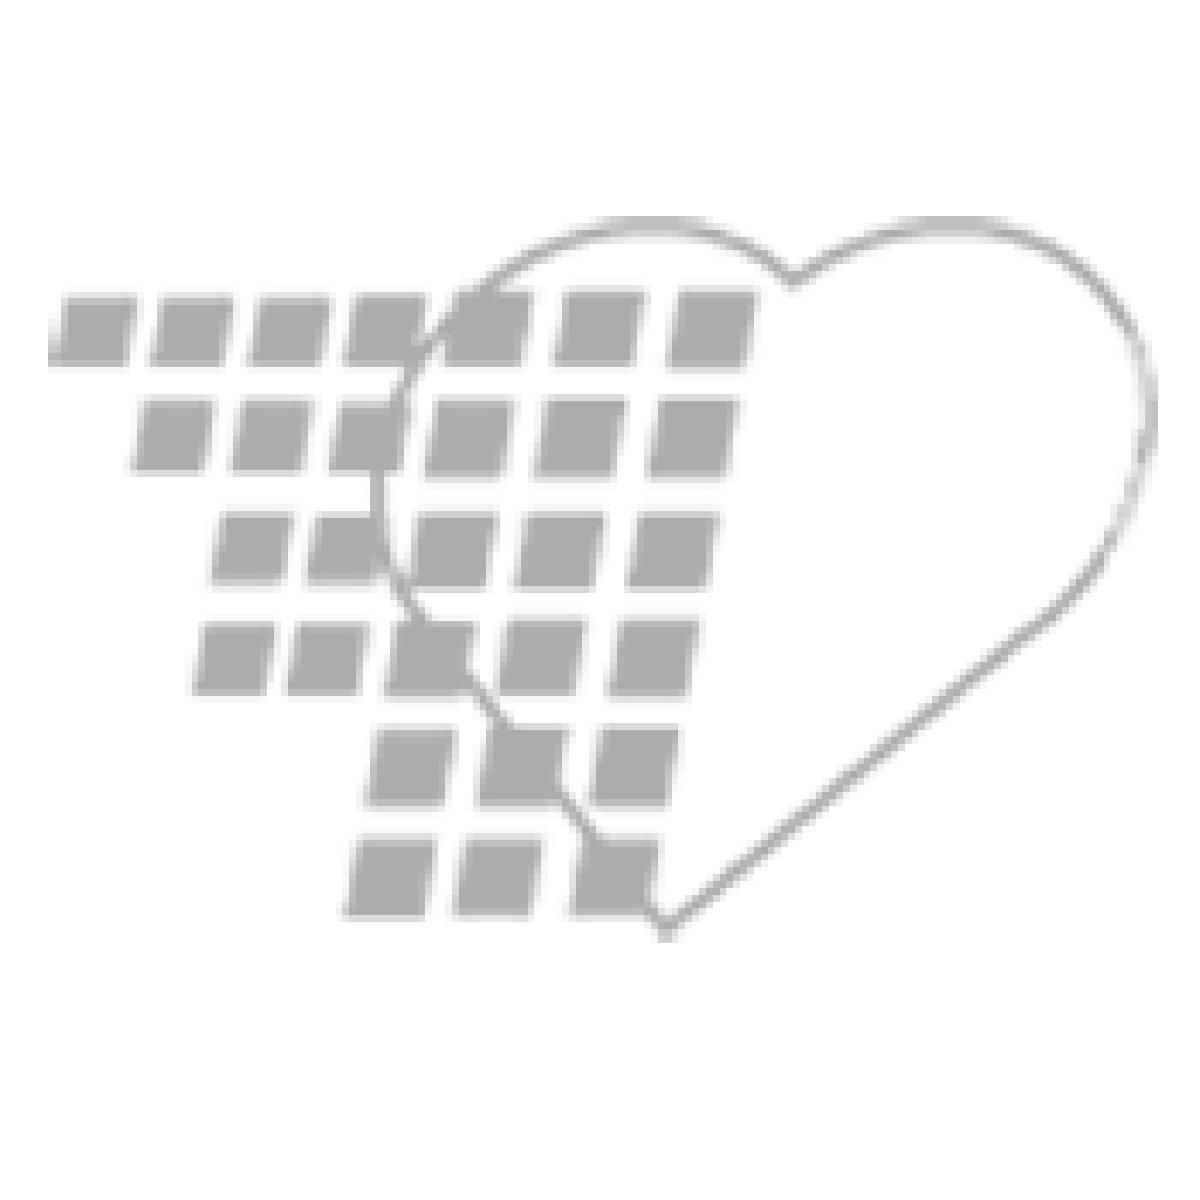 05-02-5345 White Petrolatum - 5g Foil Packs